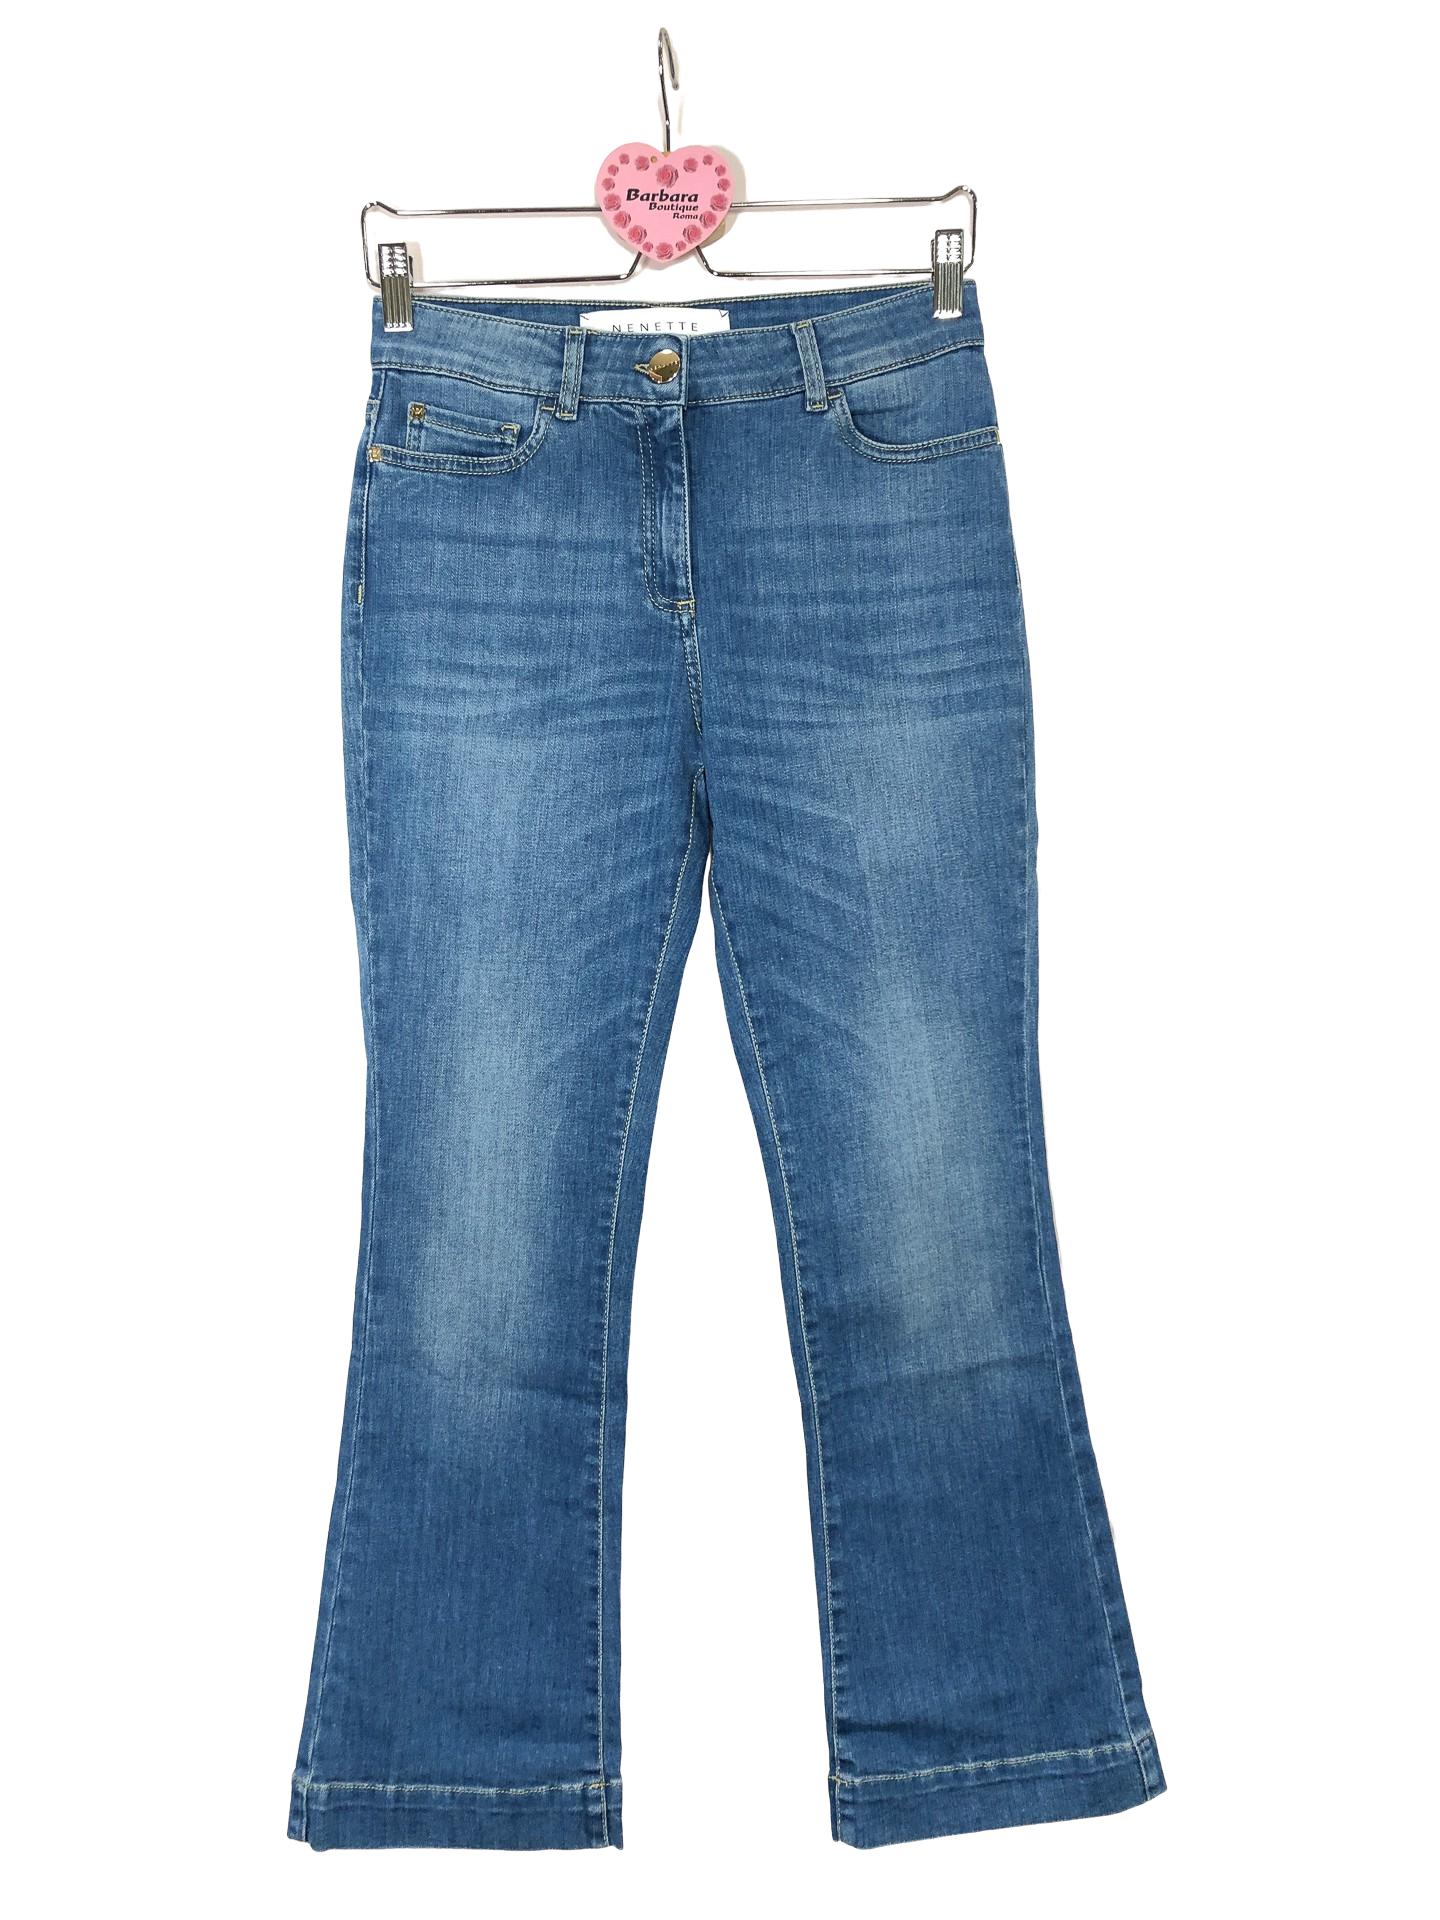 Jeans trombetta samu